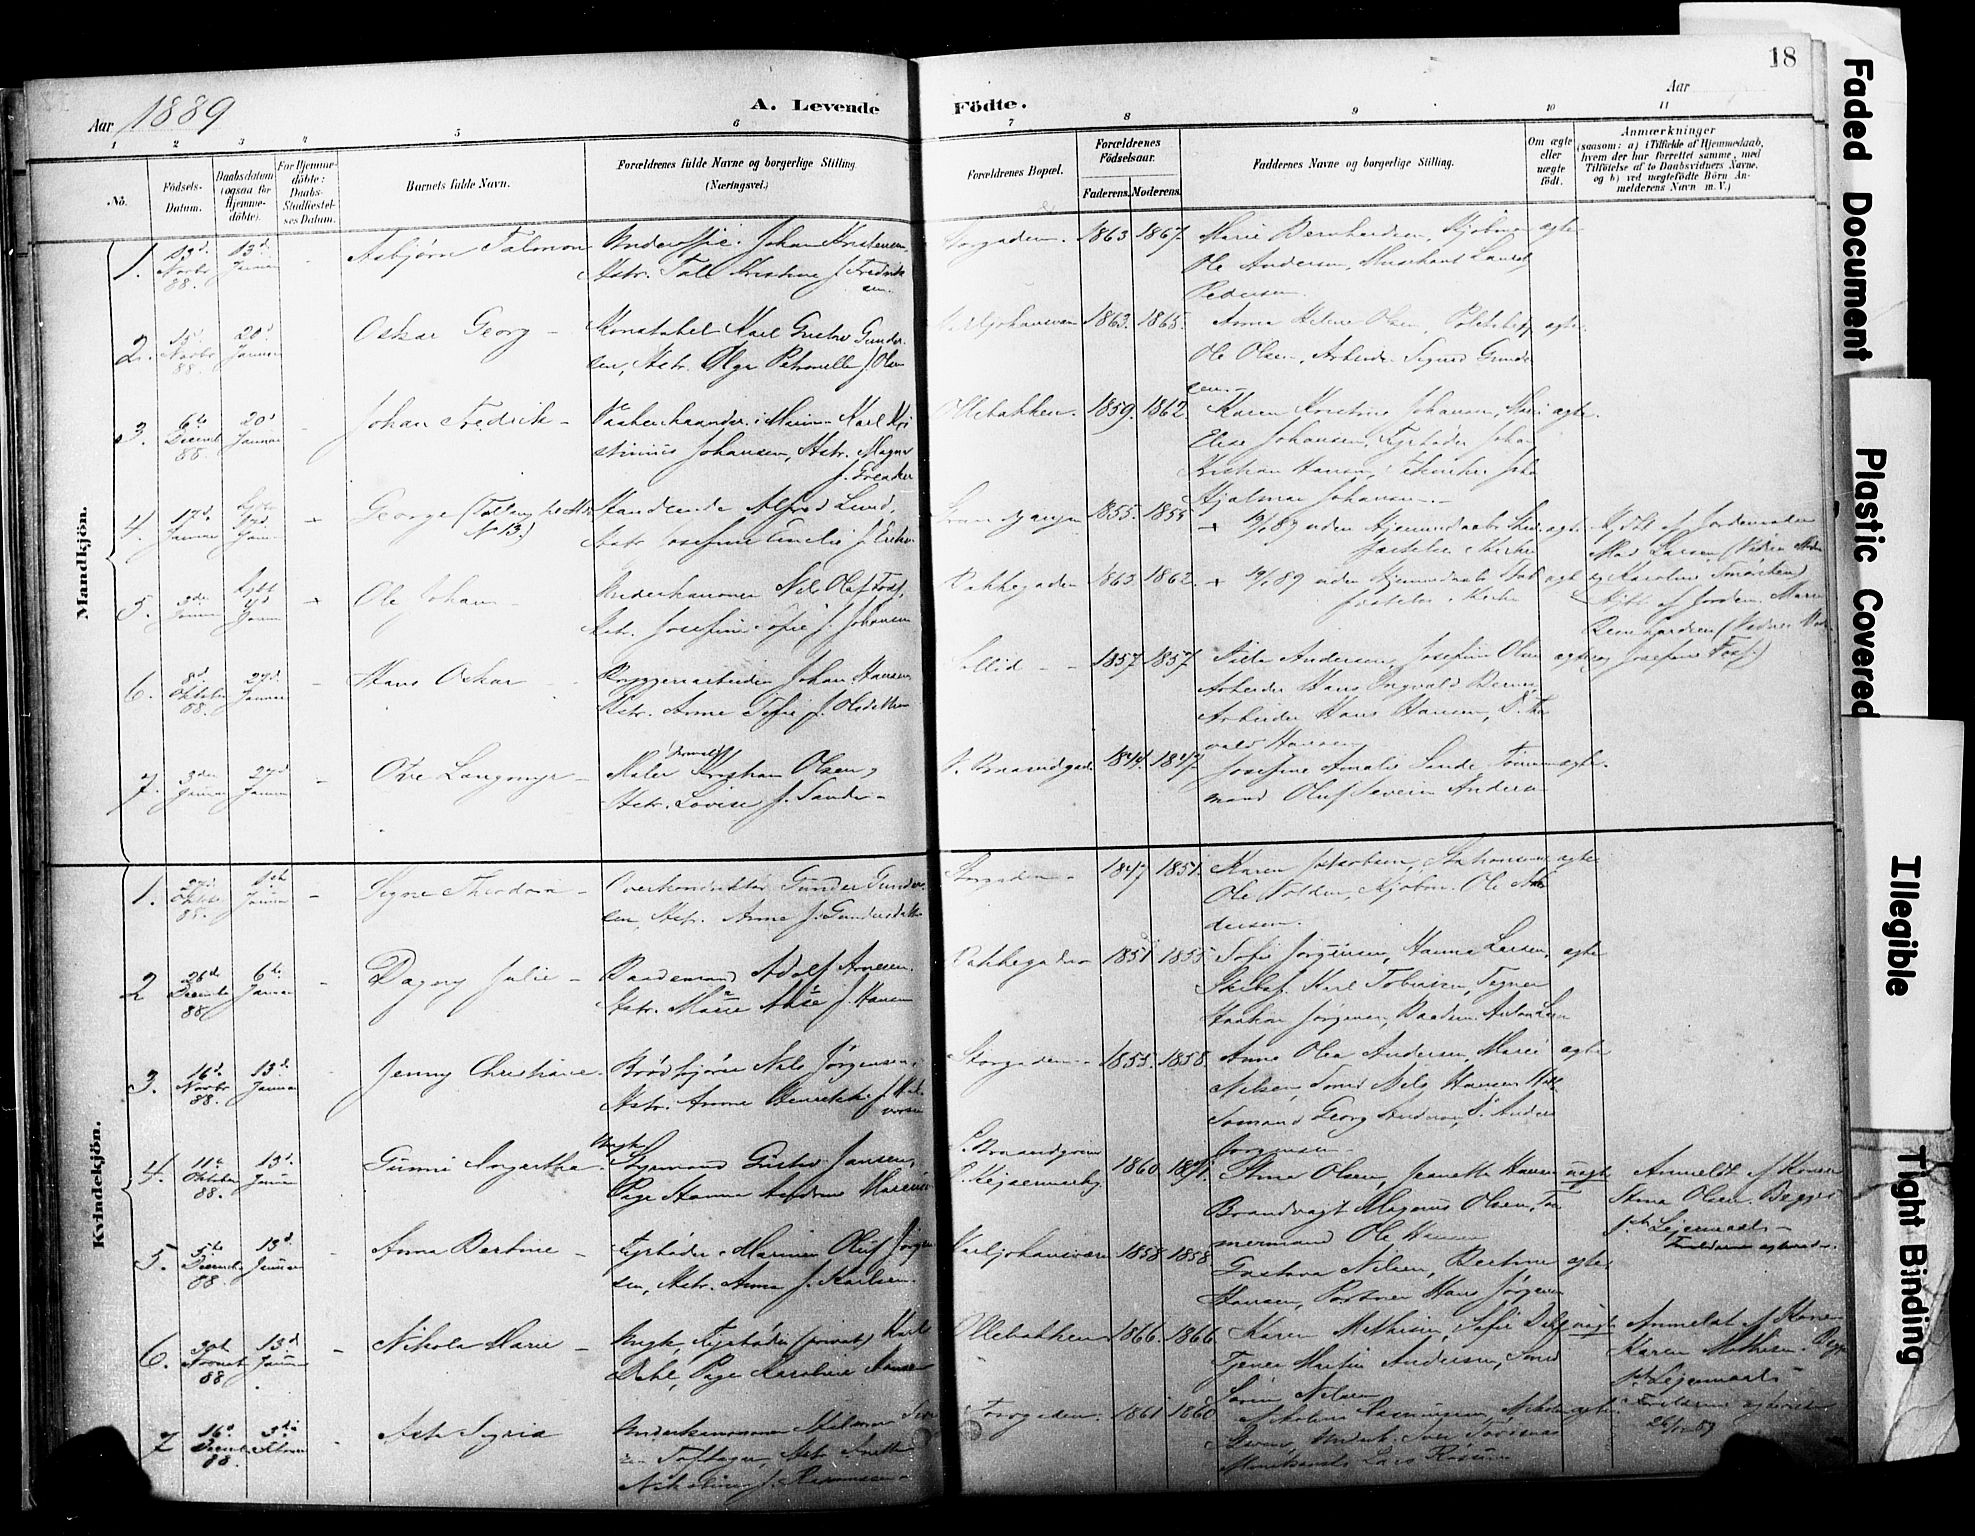 SAKO, Horten kirkebøker, F/Fa/L0004: Parish register (official) no. 4, 1888-1895, p. 18